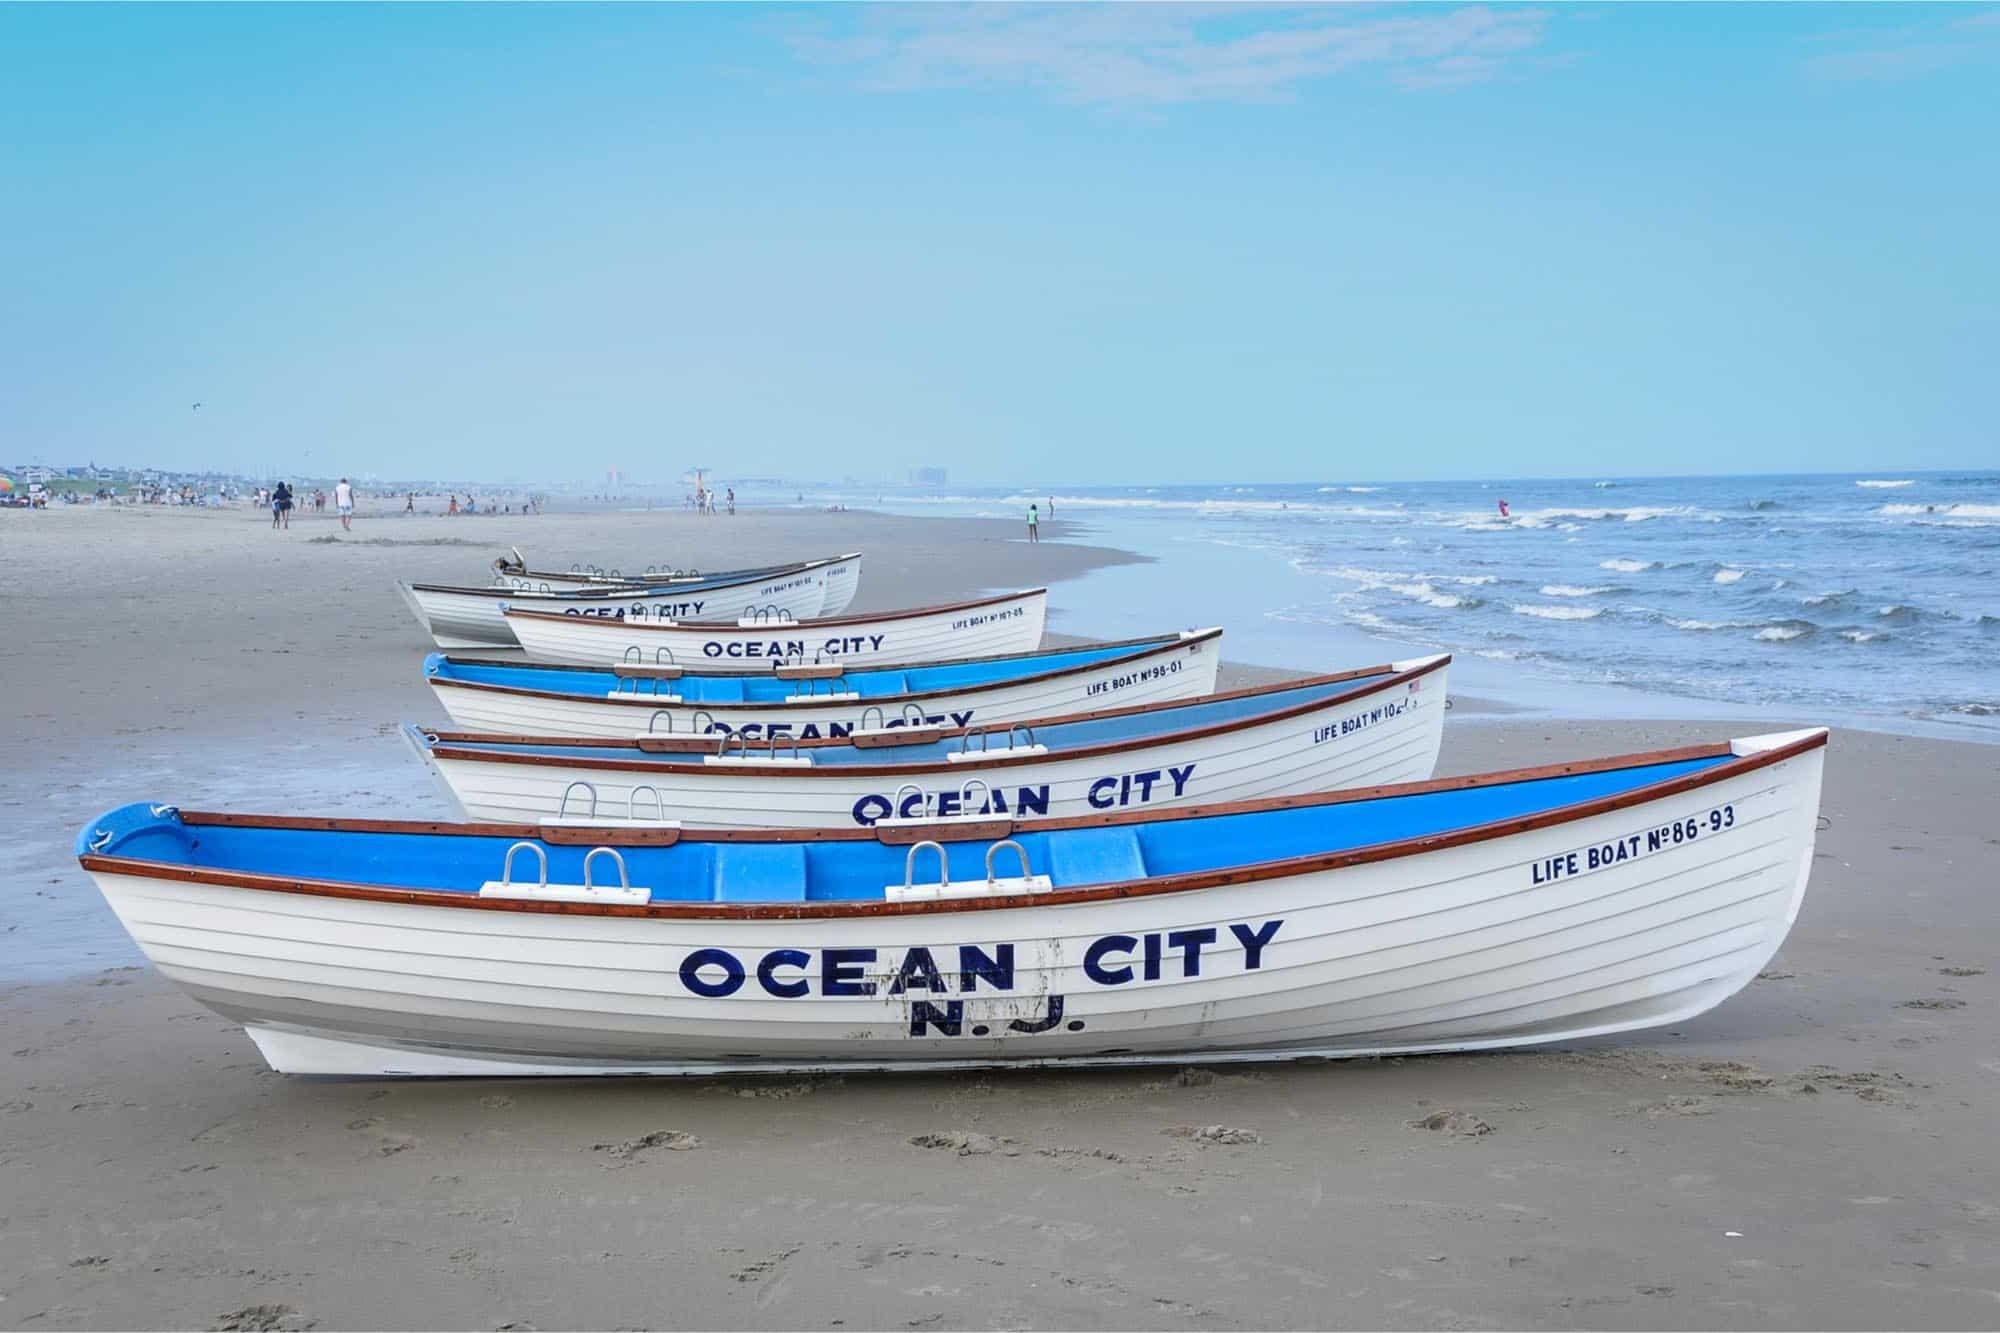 White Ocean City N.J. life boats on beach